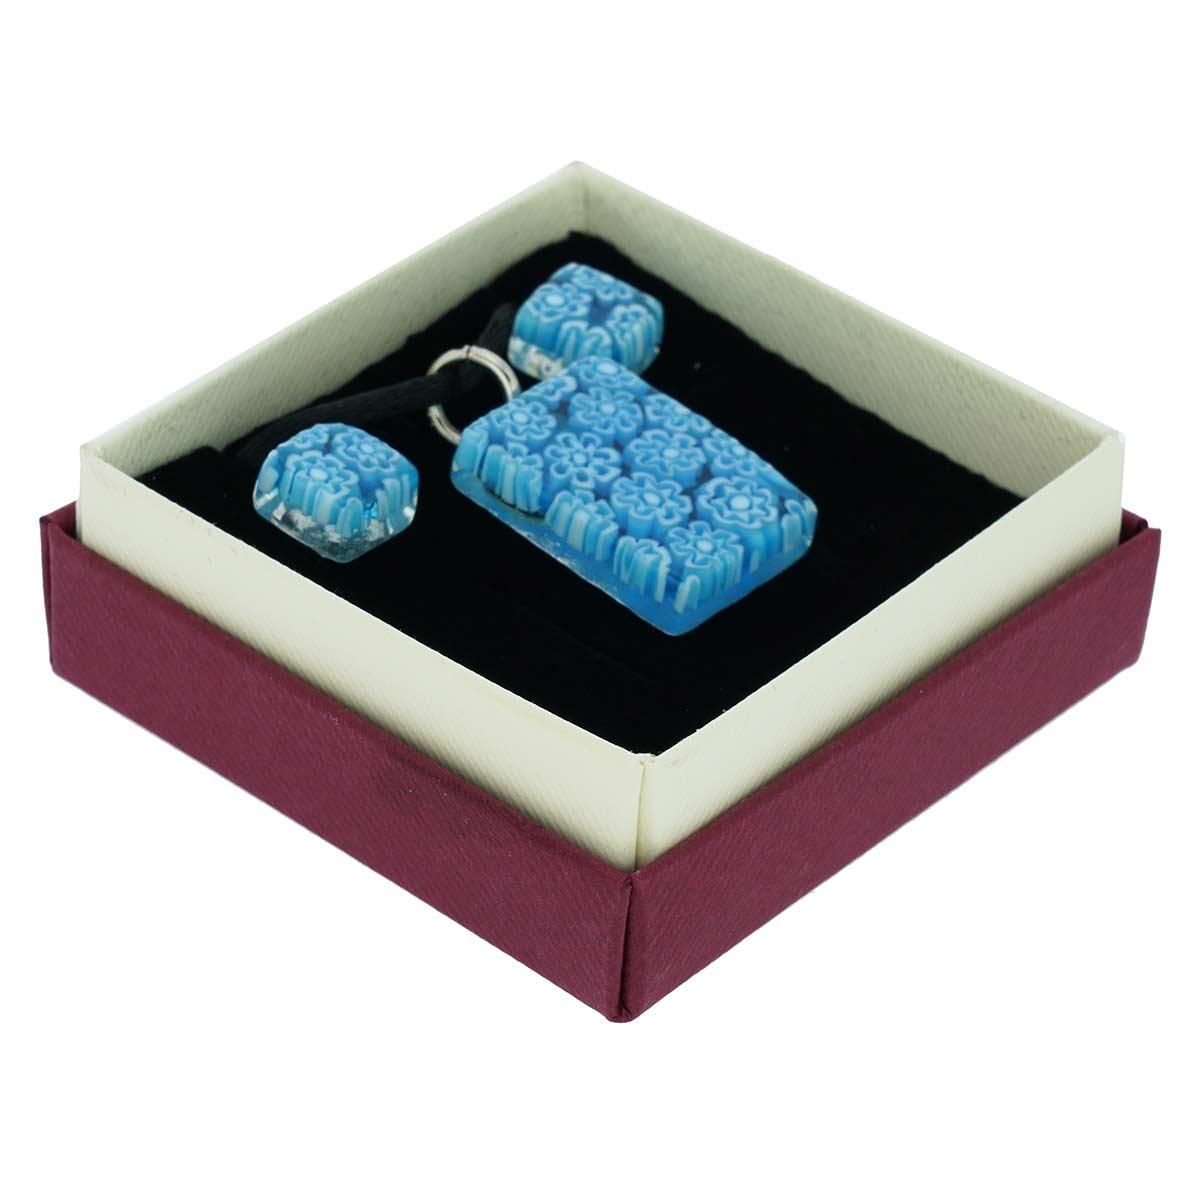 Murano Glass Millefiori Necklace and Earrings Set - Aqua Blue